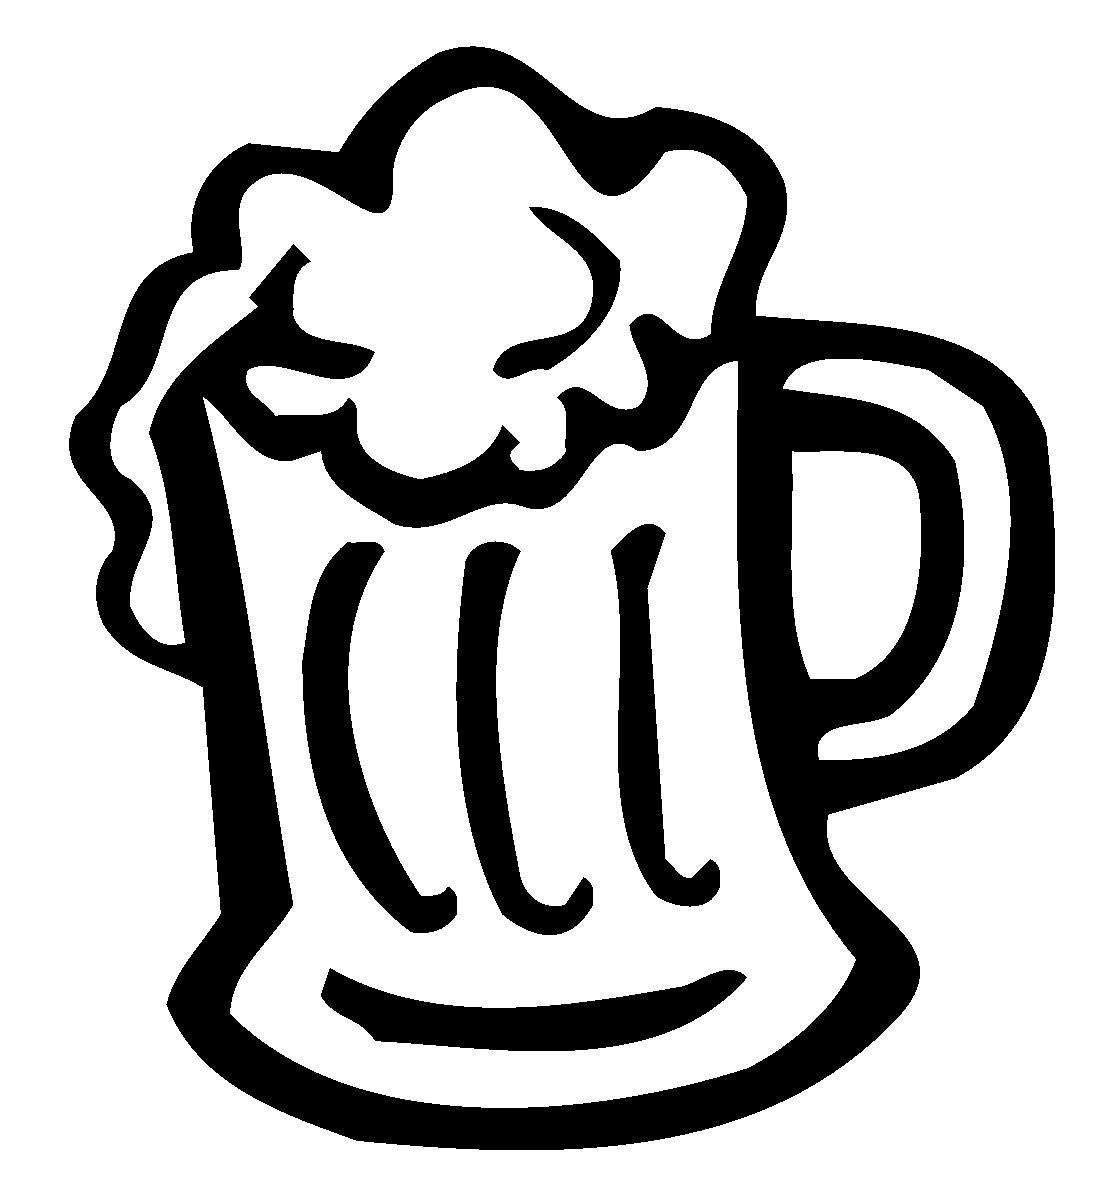 Beer Mug Decal Beer Mug Sticker